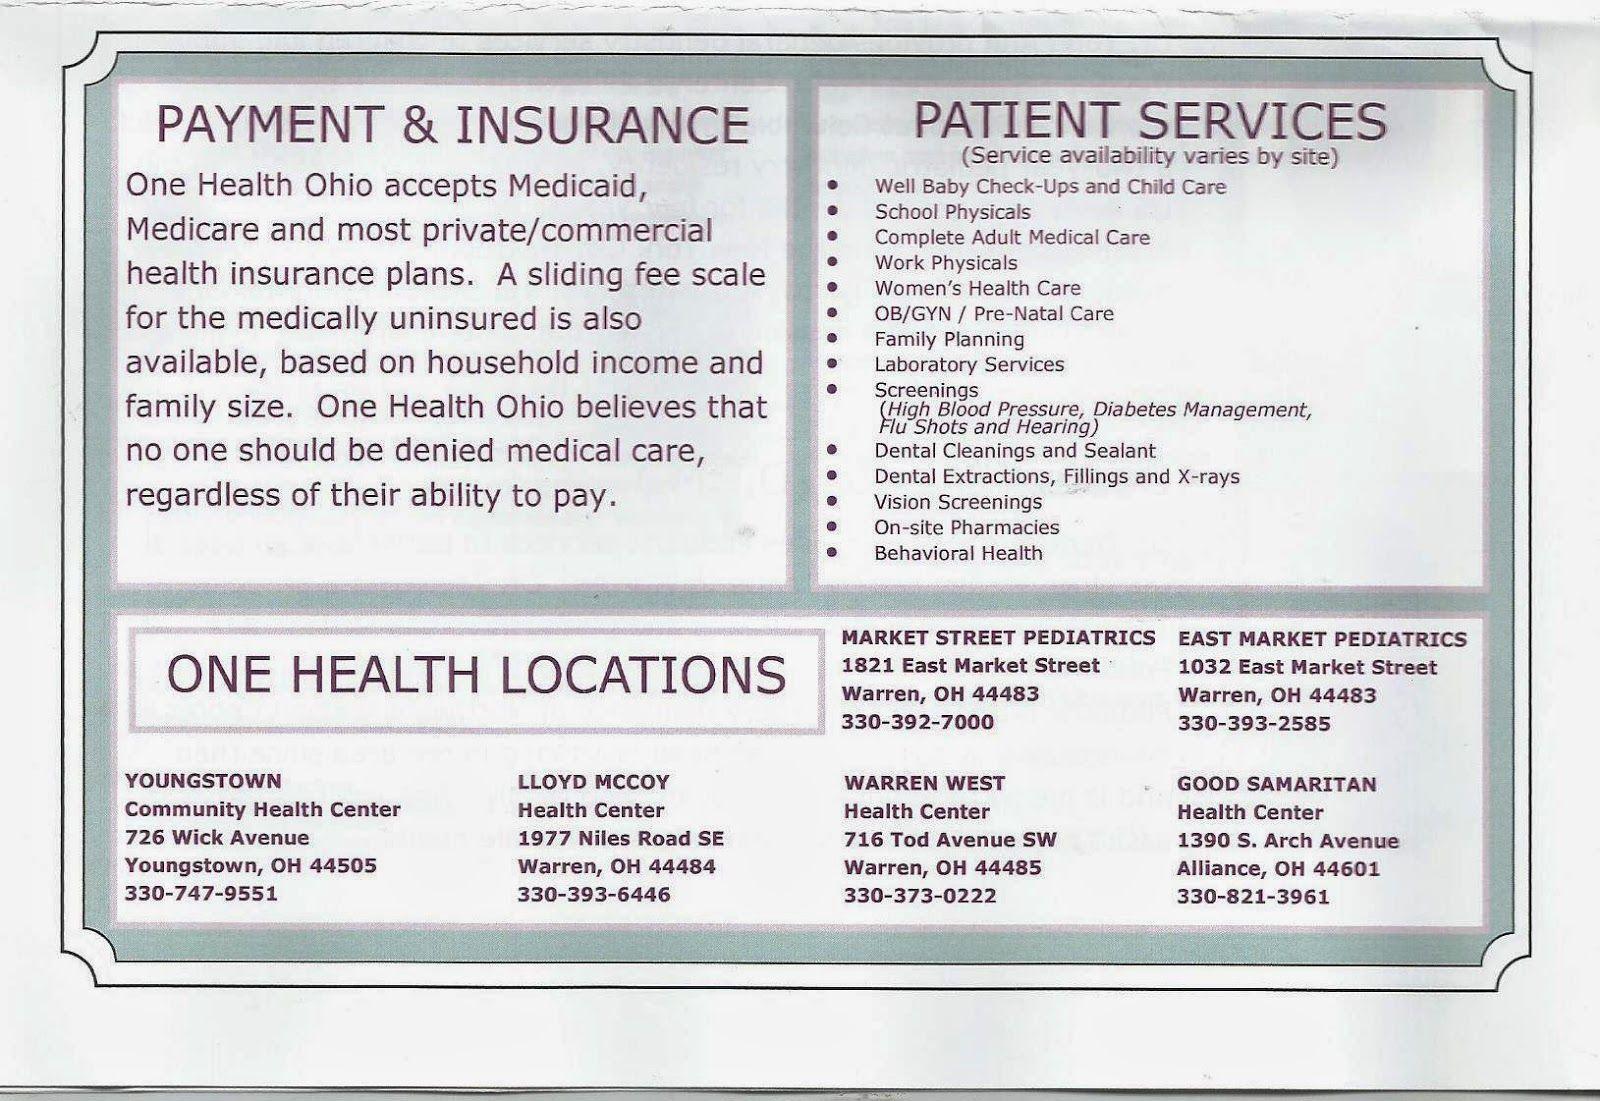 One Health Ohio First health, Health insurance plans